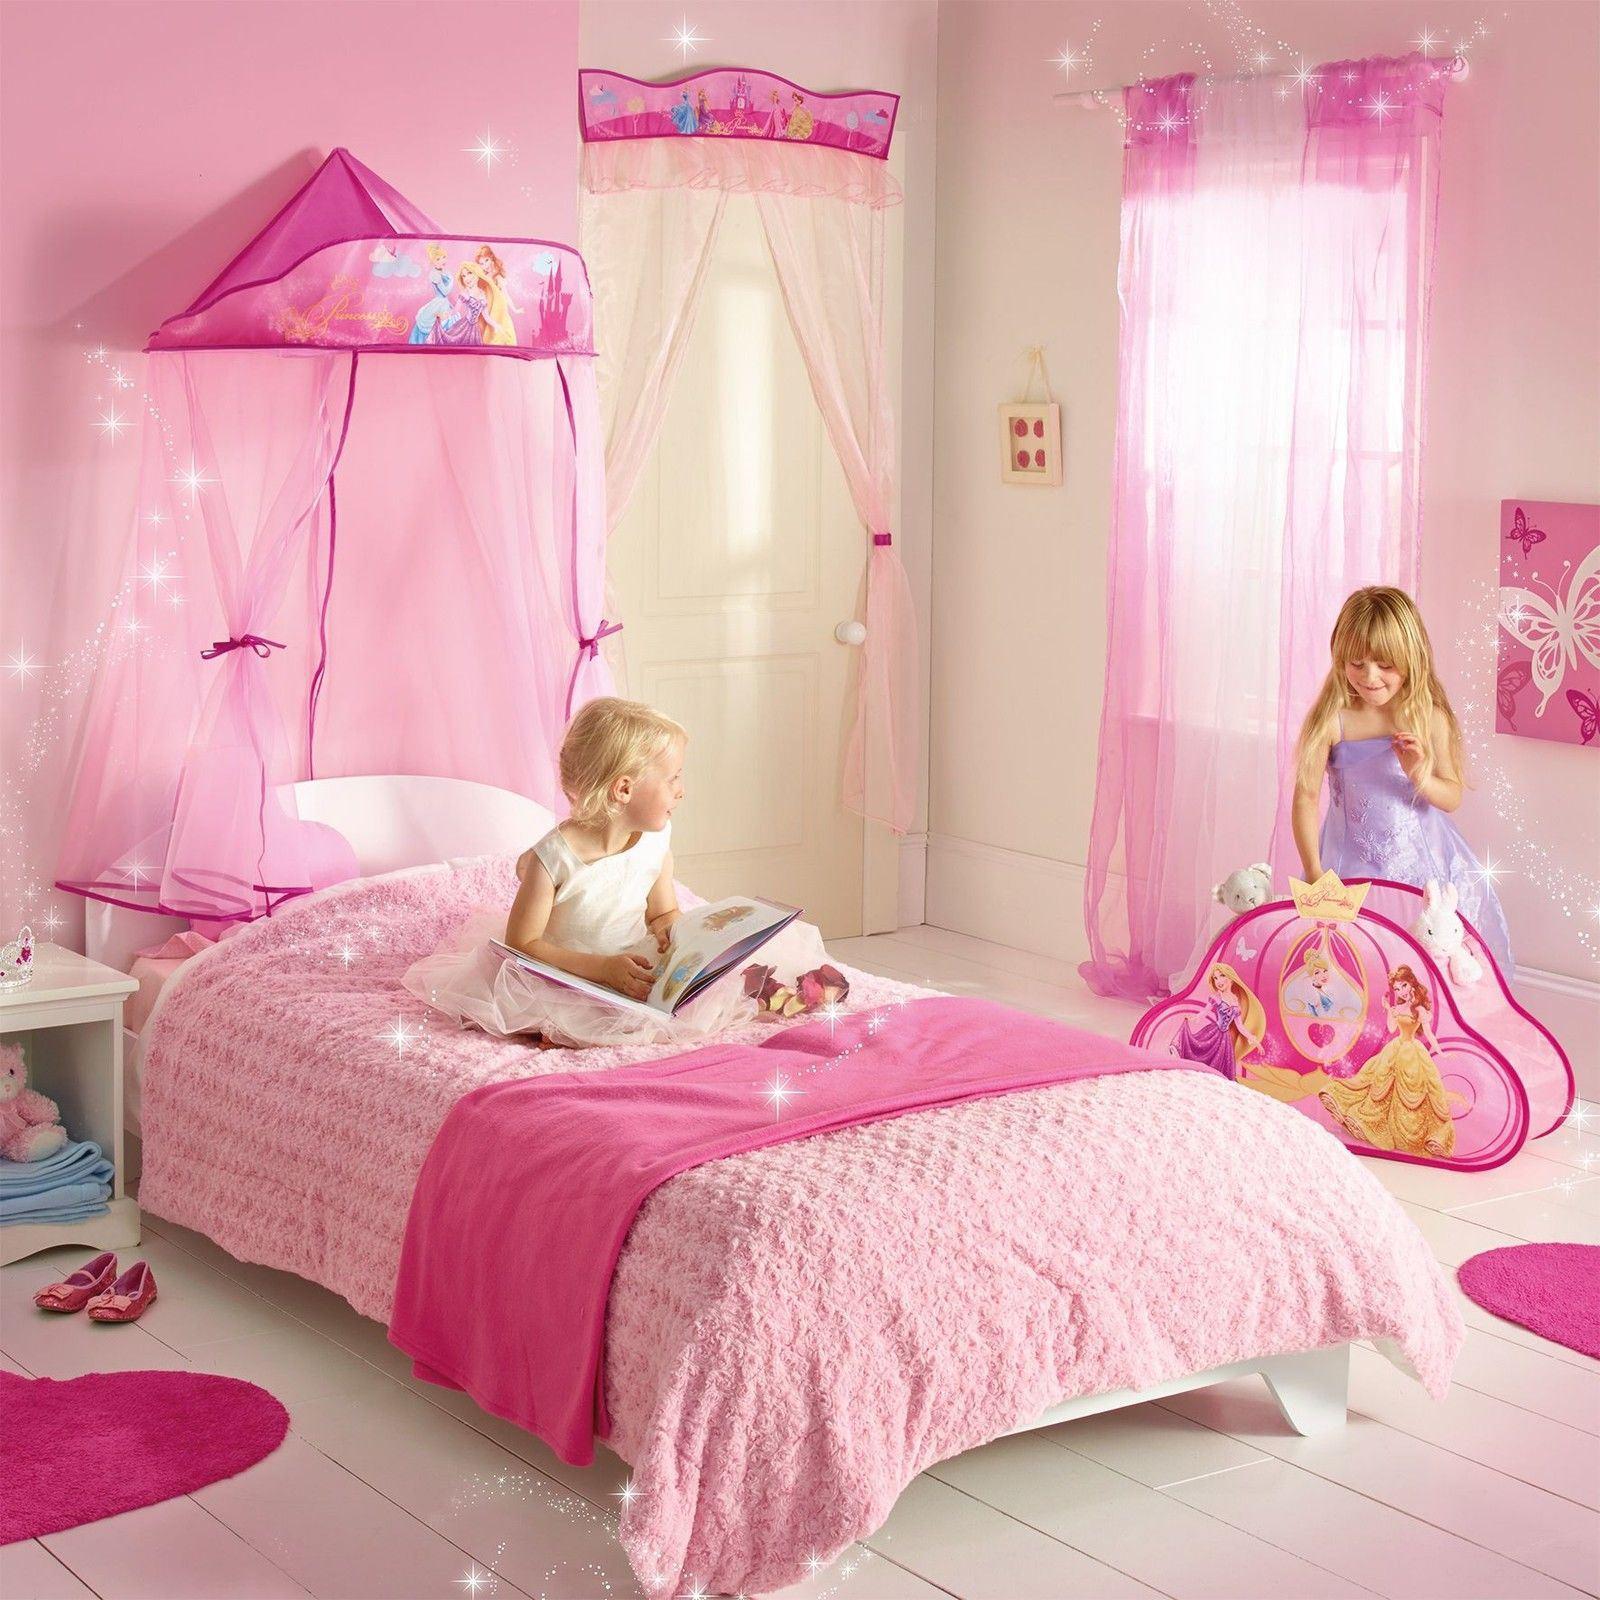 بالصور غرف اطفال بنات , صور تصميمات غرف لارق واجمل بنوته 3640 4